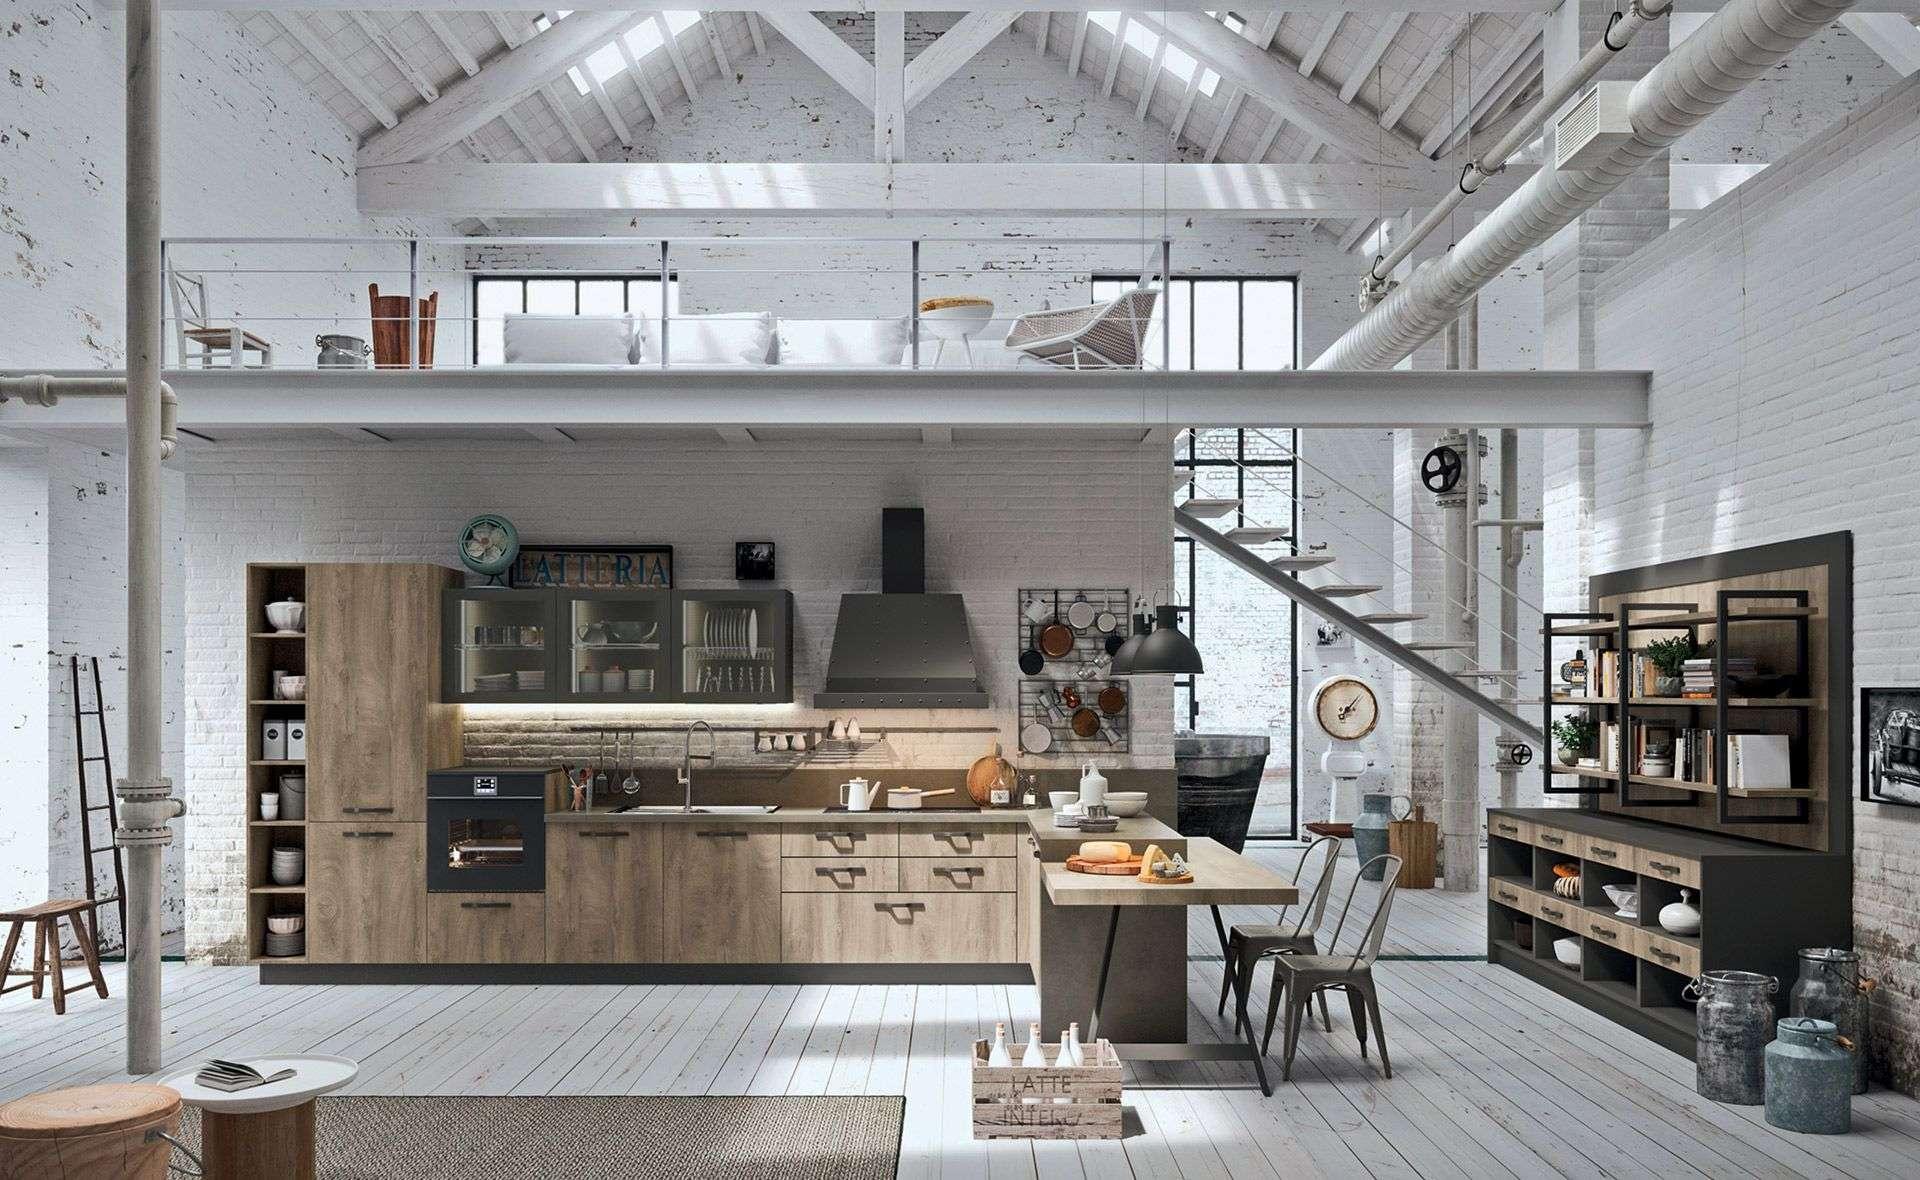 Cool cucine industrial chic fw81 pineglen - Cucine astra opinioni ...